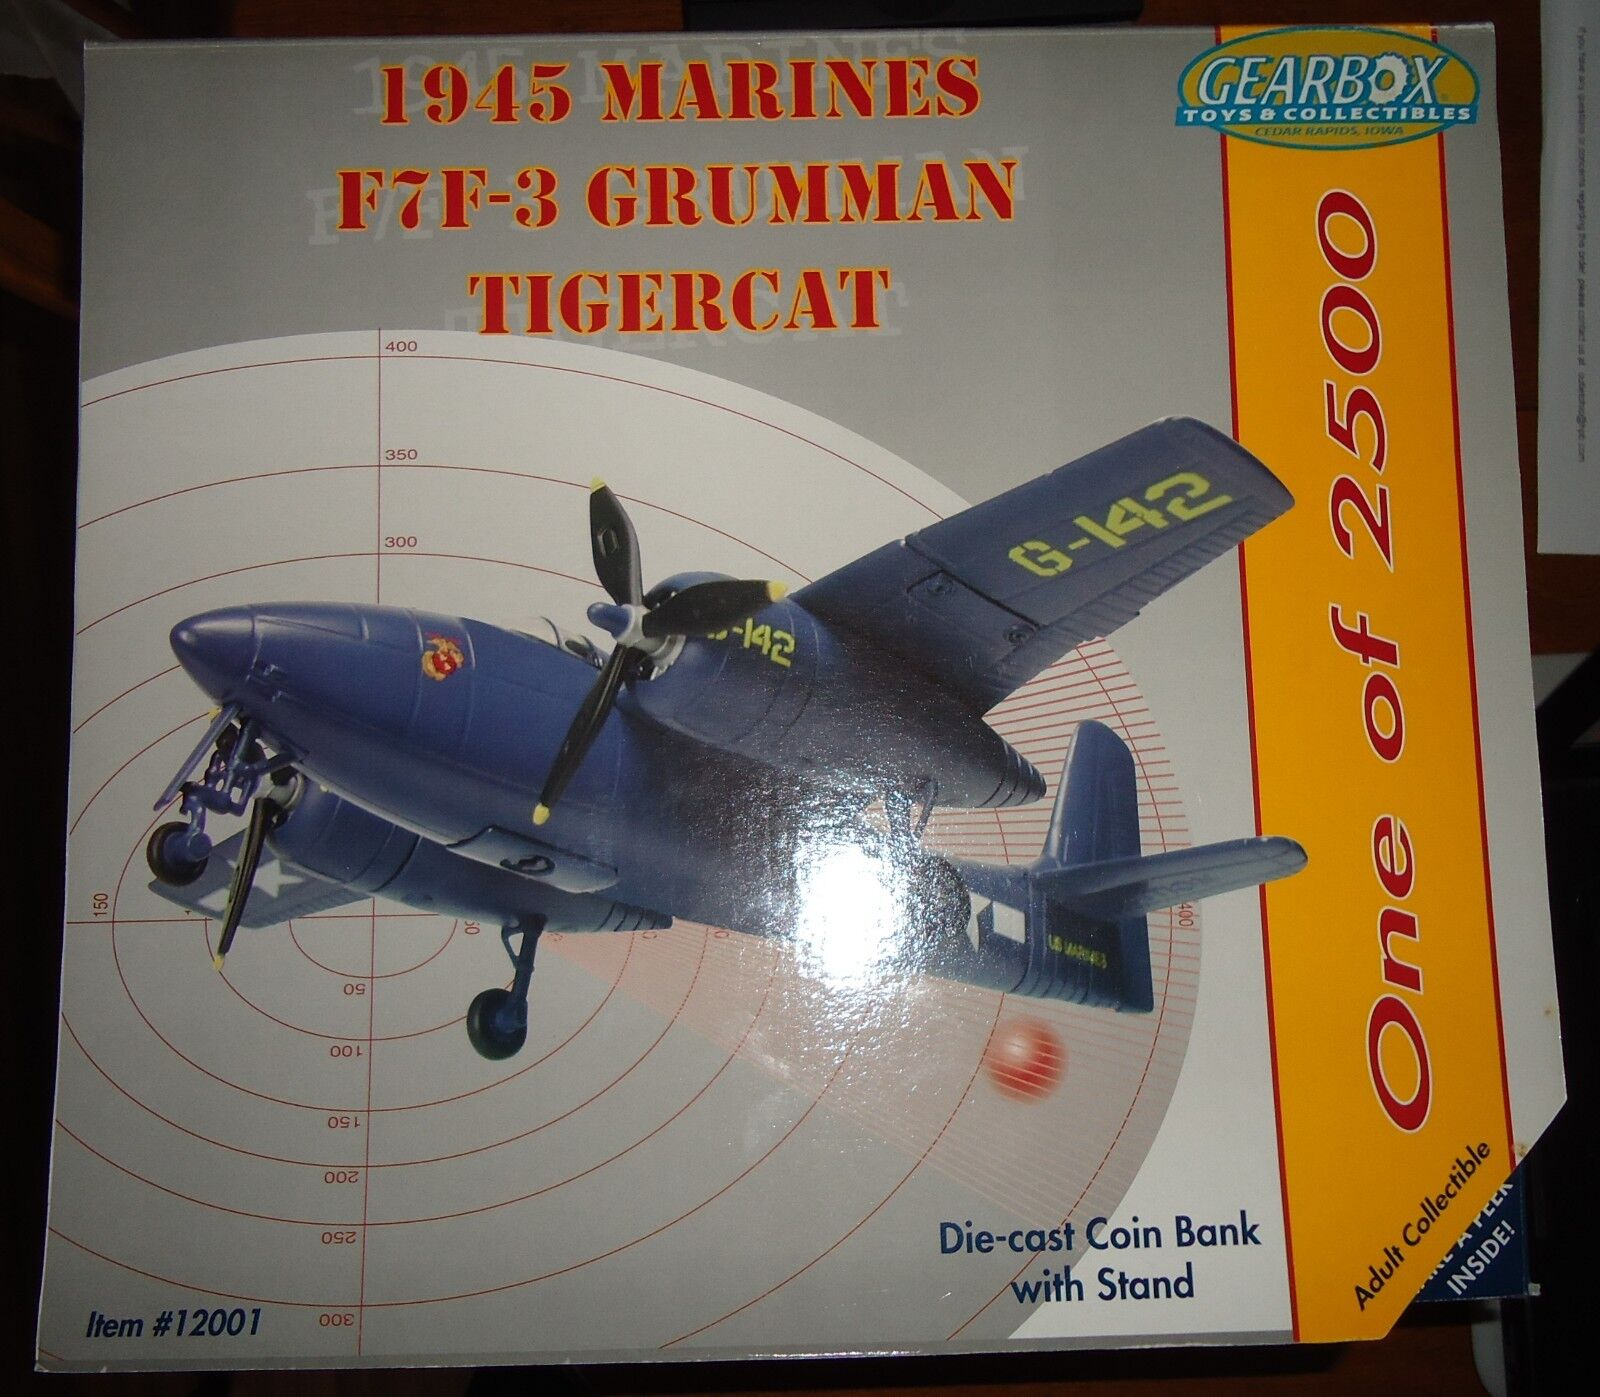 1945 Marines F7F-3 Grumman Tigercat Diecast Gearbox Neuf dans sa boîte Limited Edition 1 2500